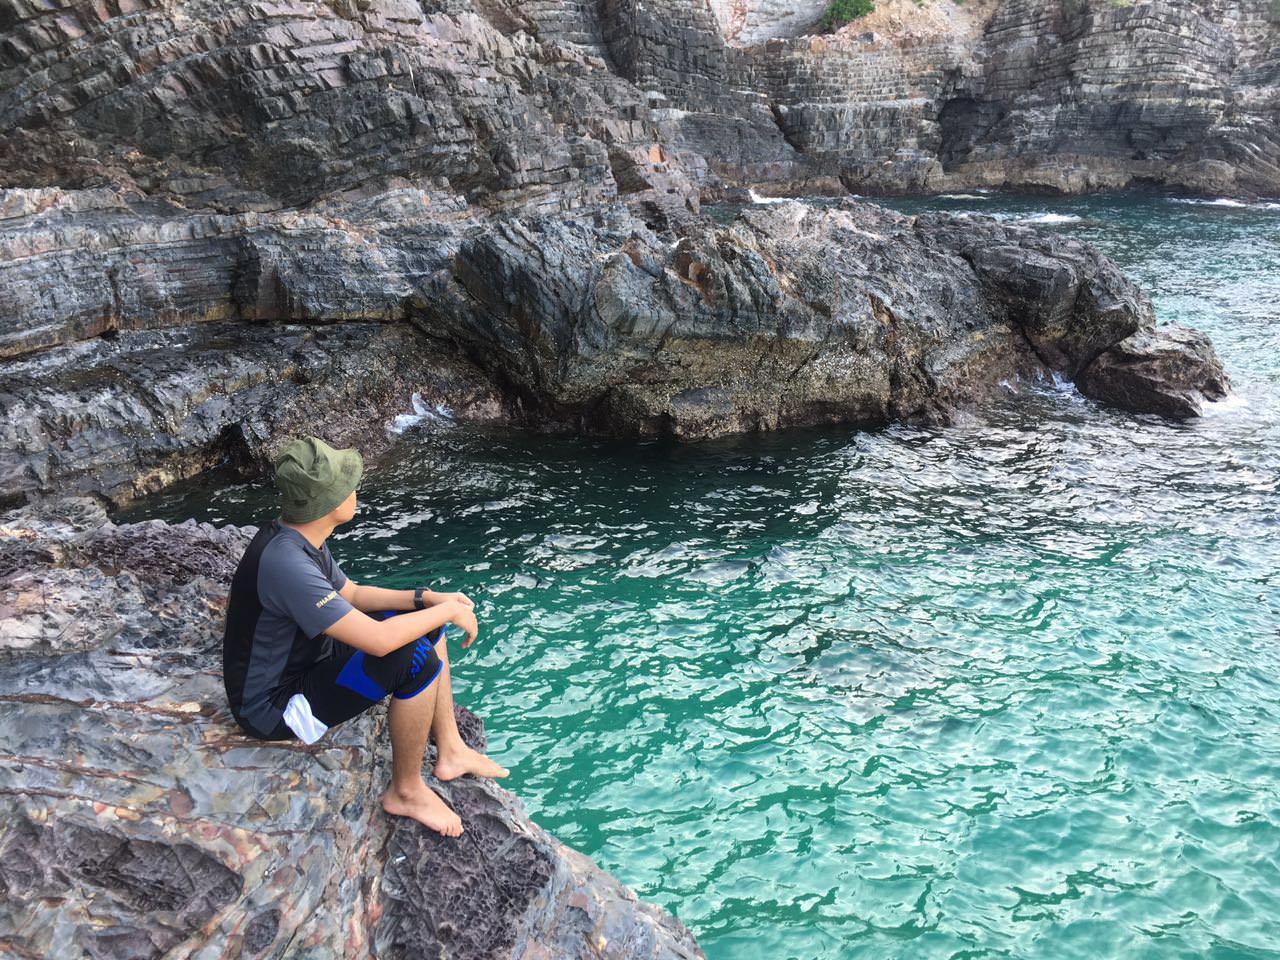 Pulau kapas 13